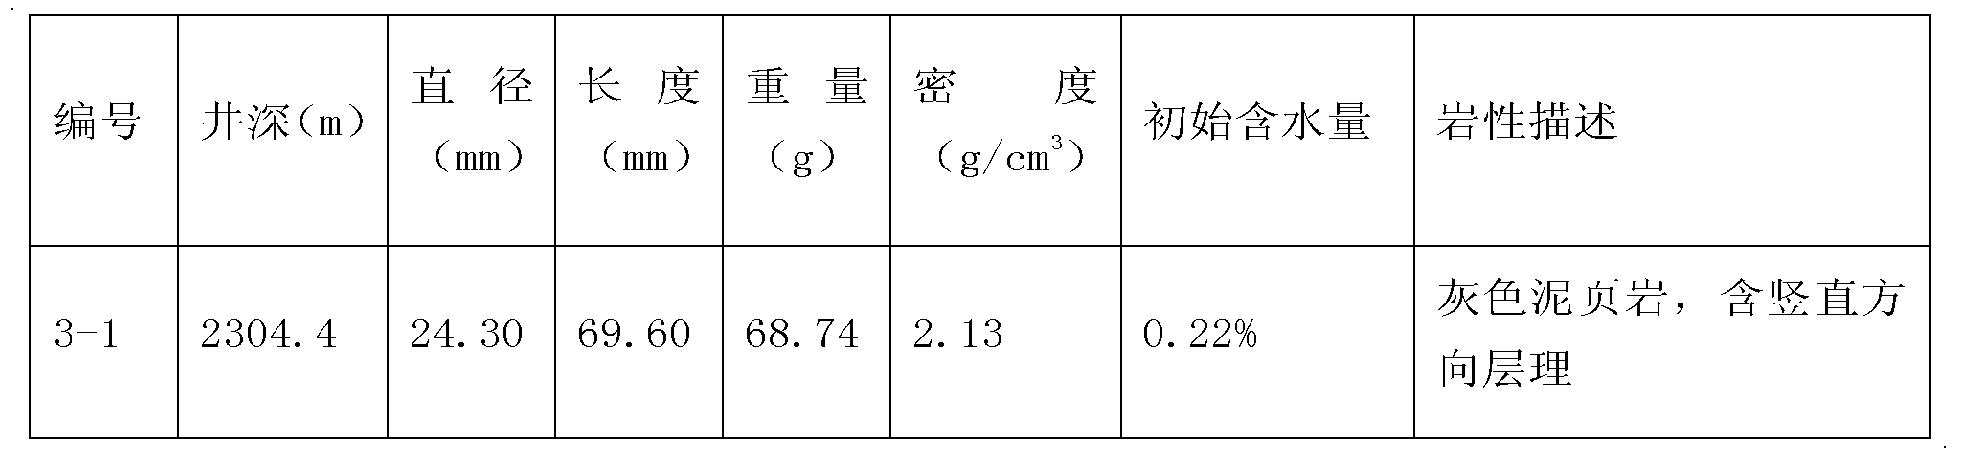 Figure CN202339307UD00051